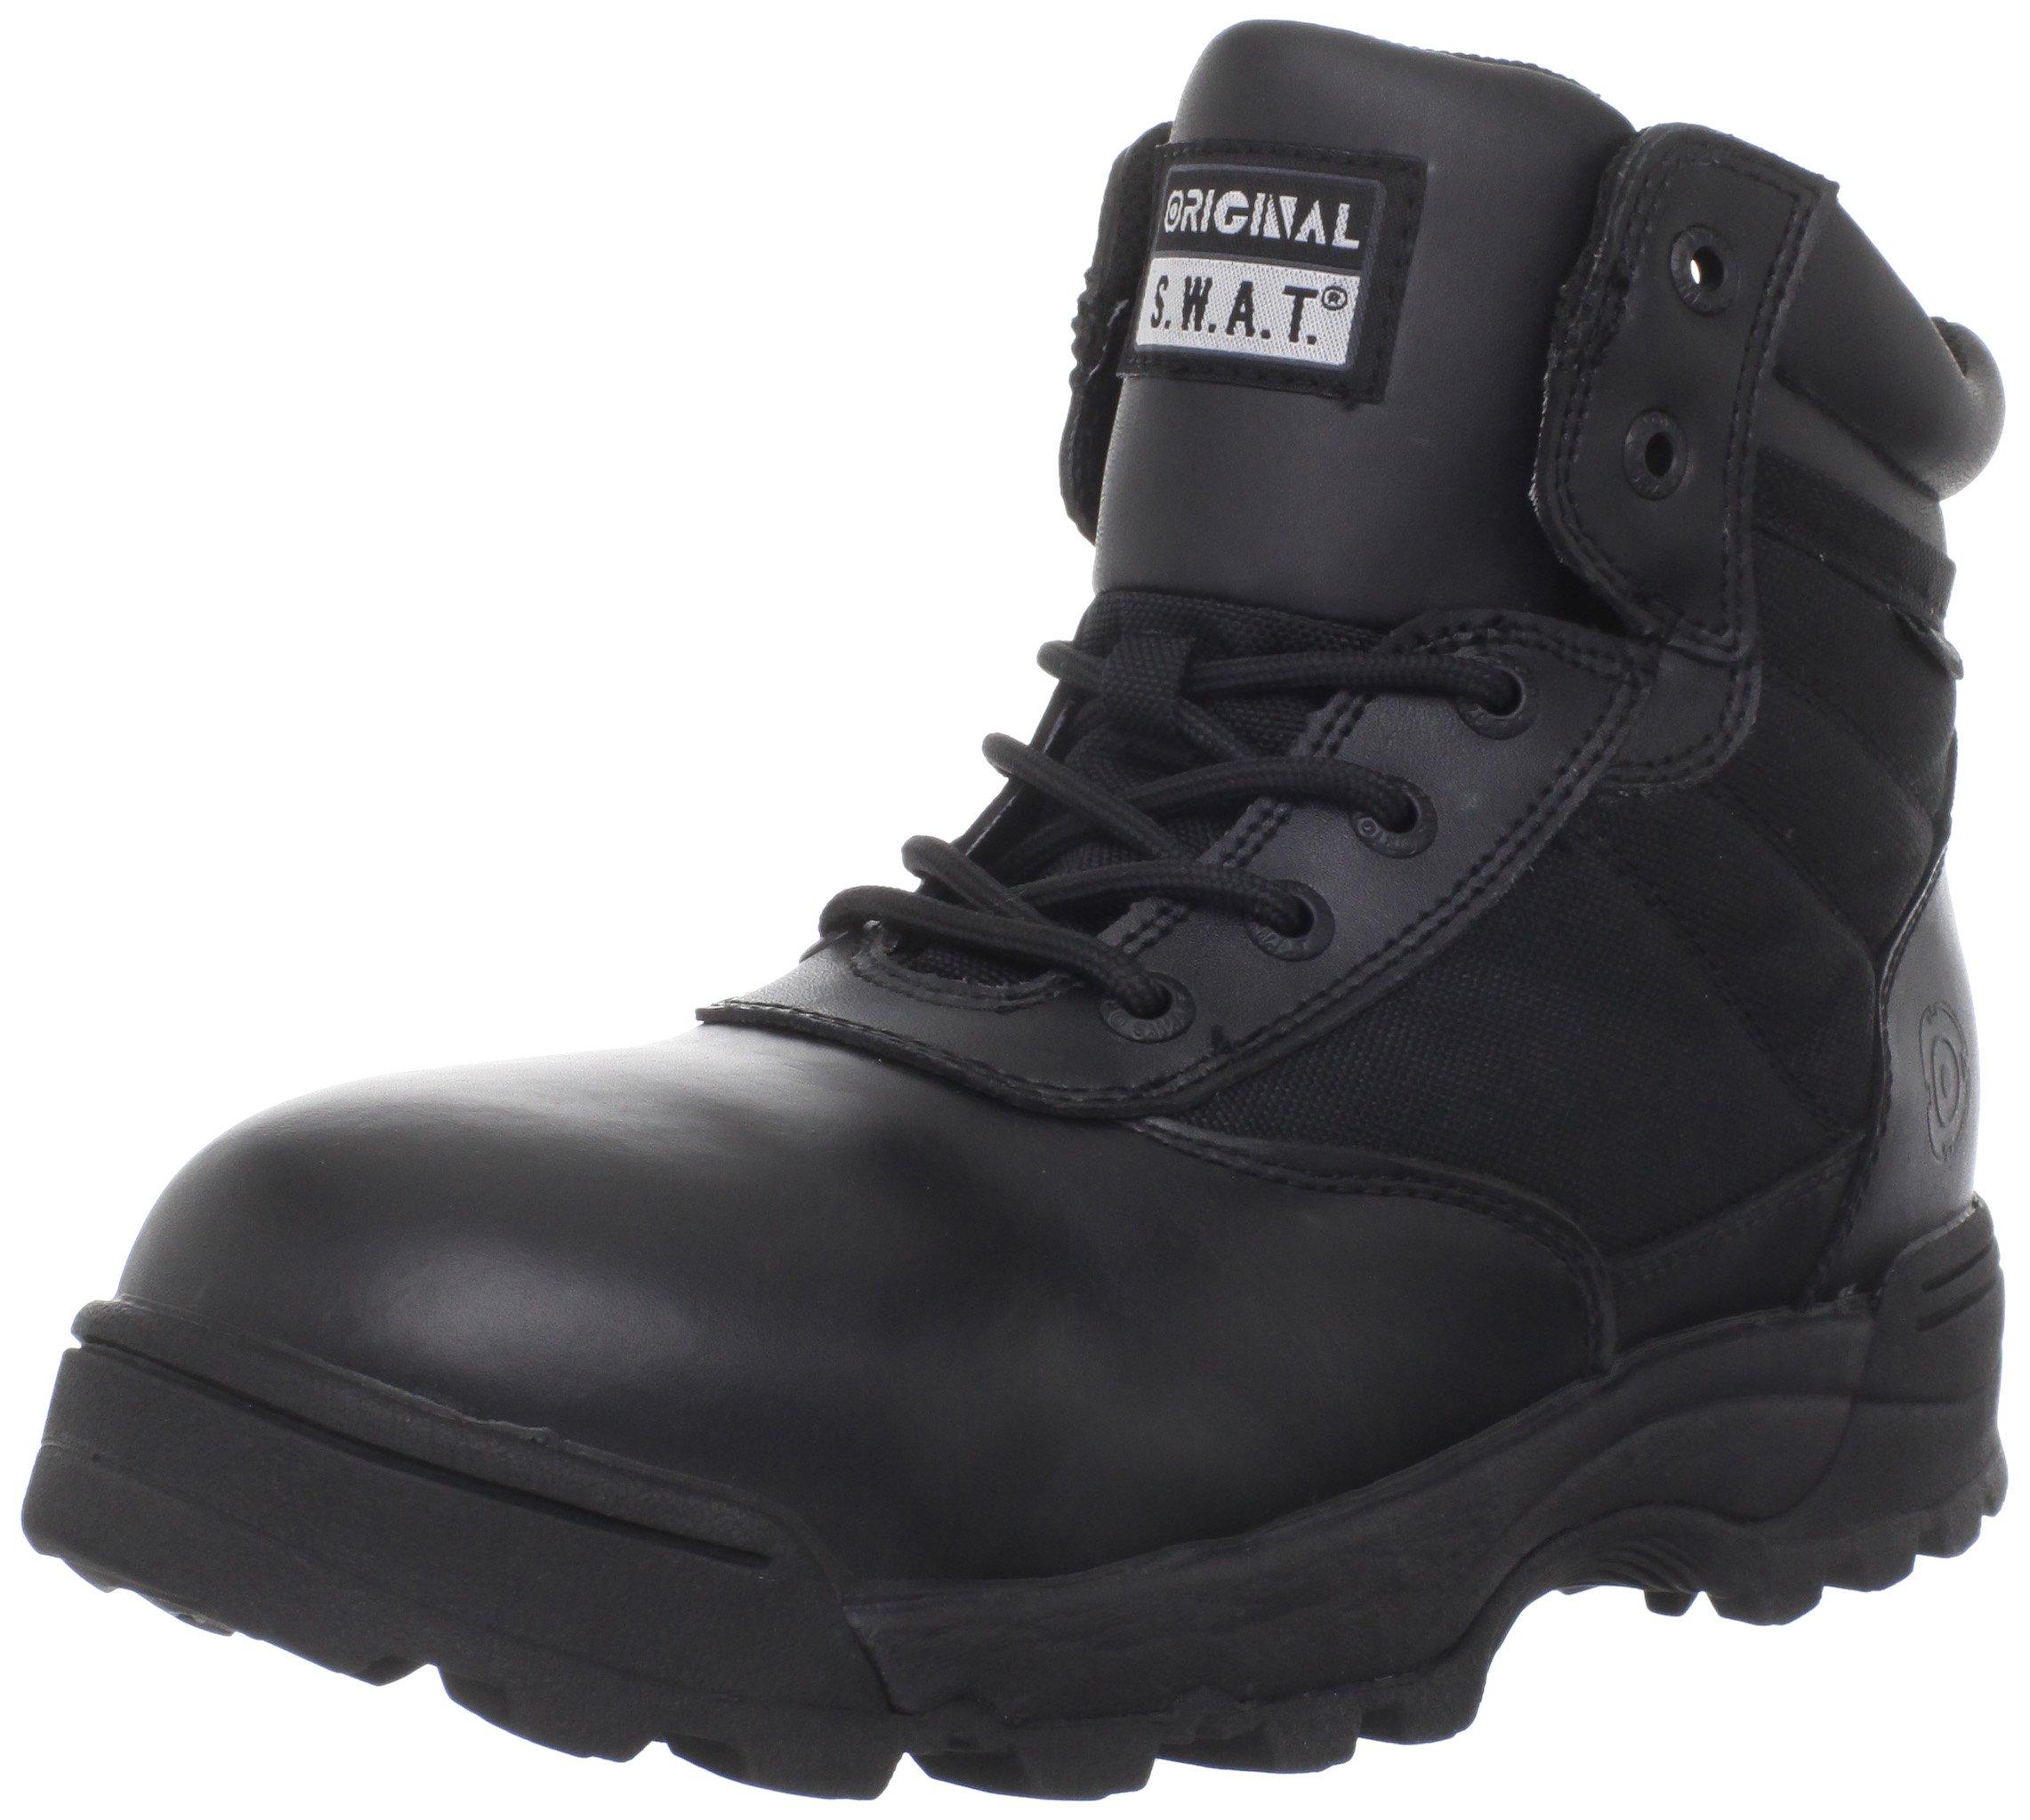 "Original S.W.A.T. Men's Classic 6"" Waterproof CST Work Boot"